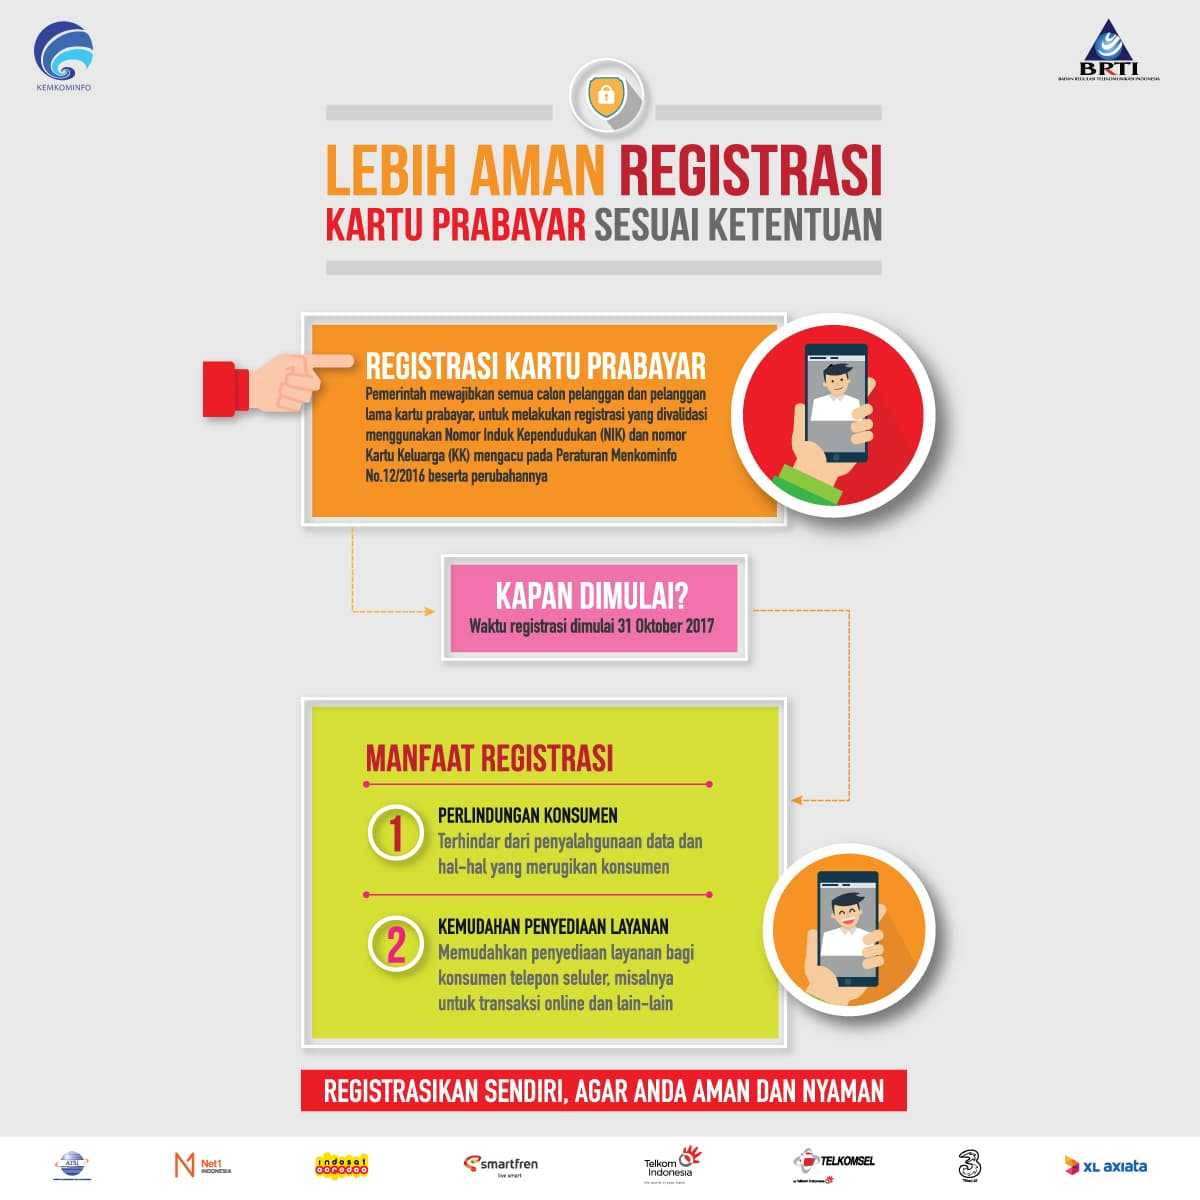 Aturan baru Kemenkominfo mewajibkan pelanggan lama untuk Registrasi Kartu SIM ulang dengan KTP dan KK asli